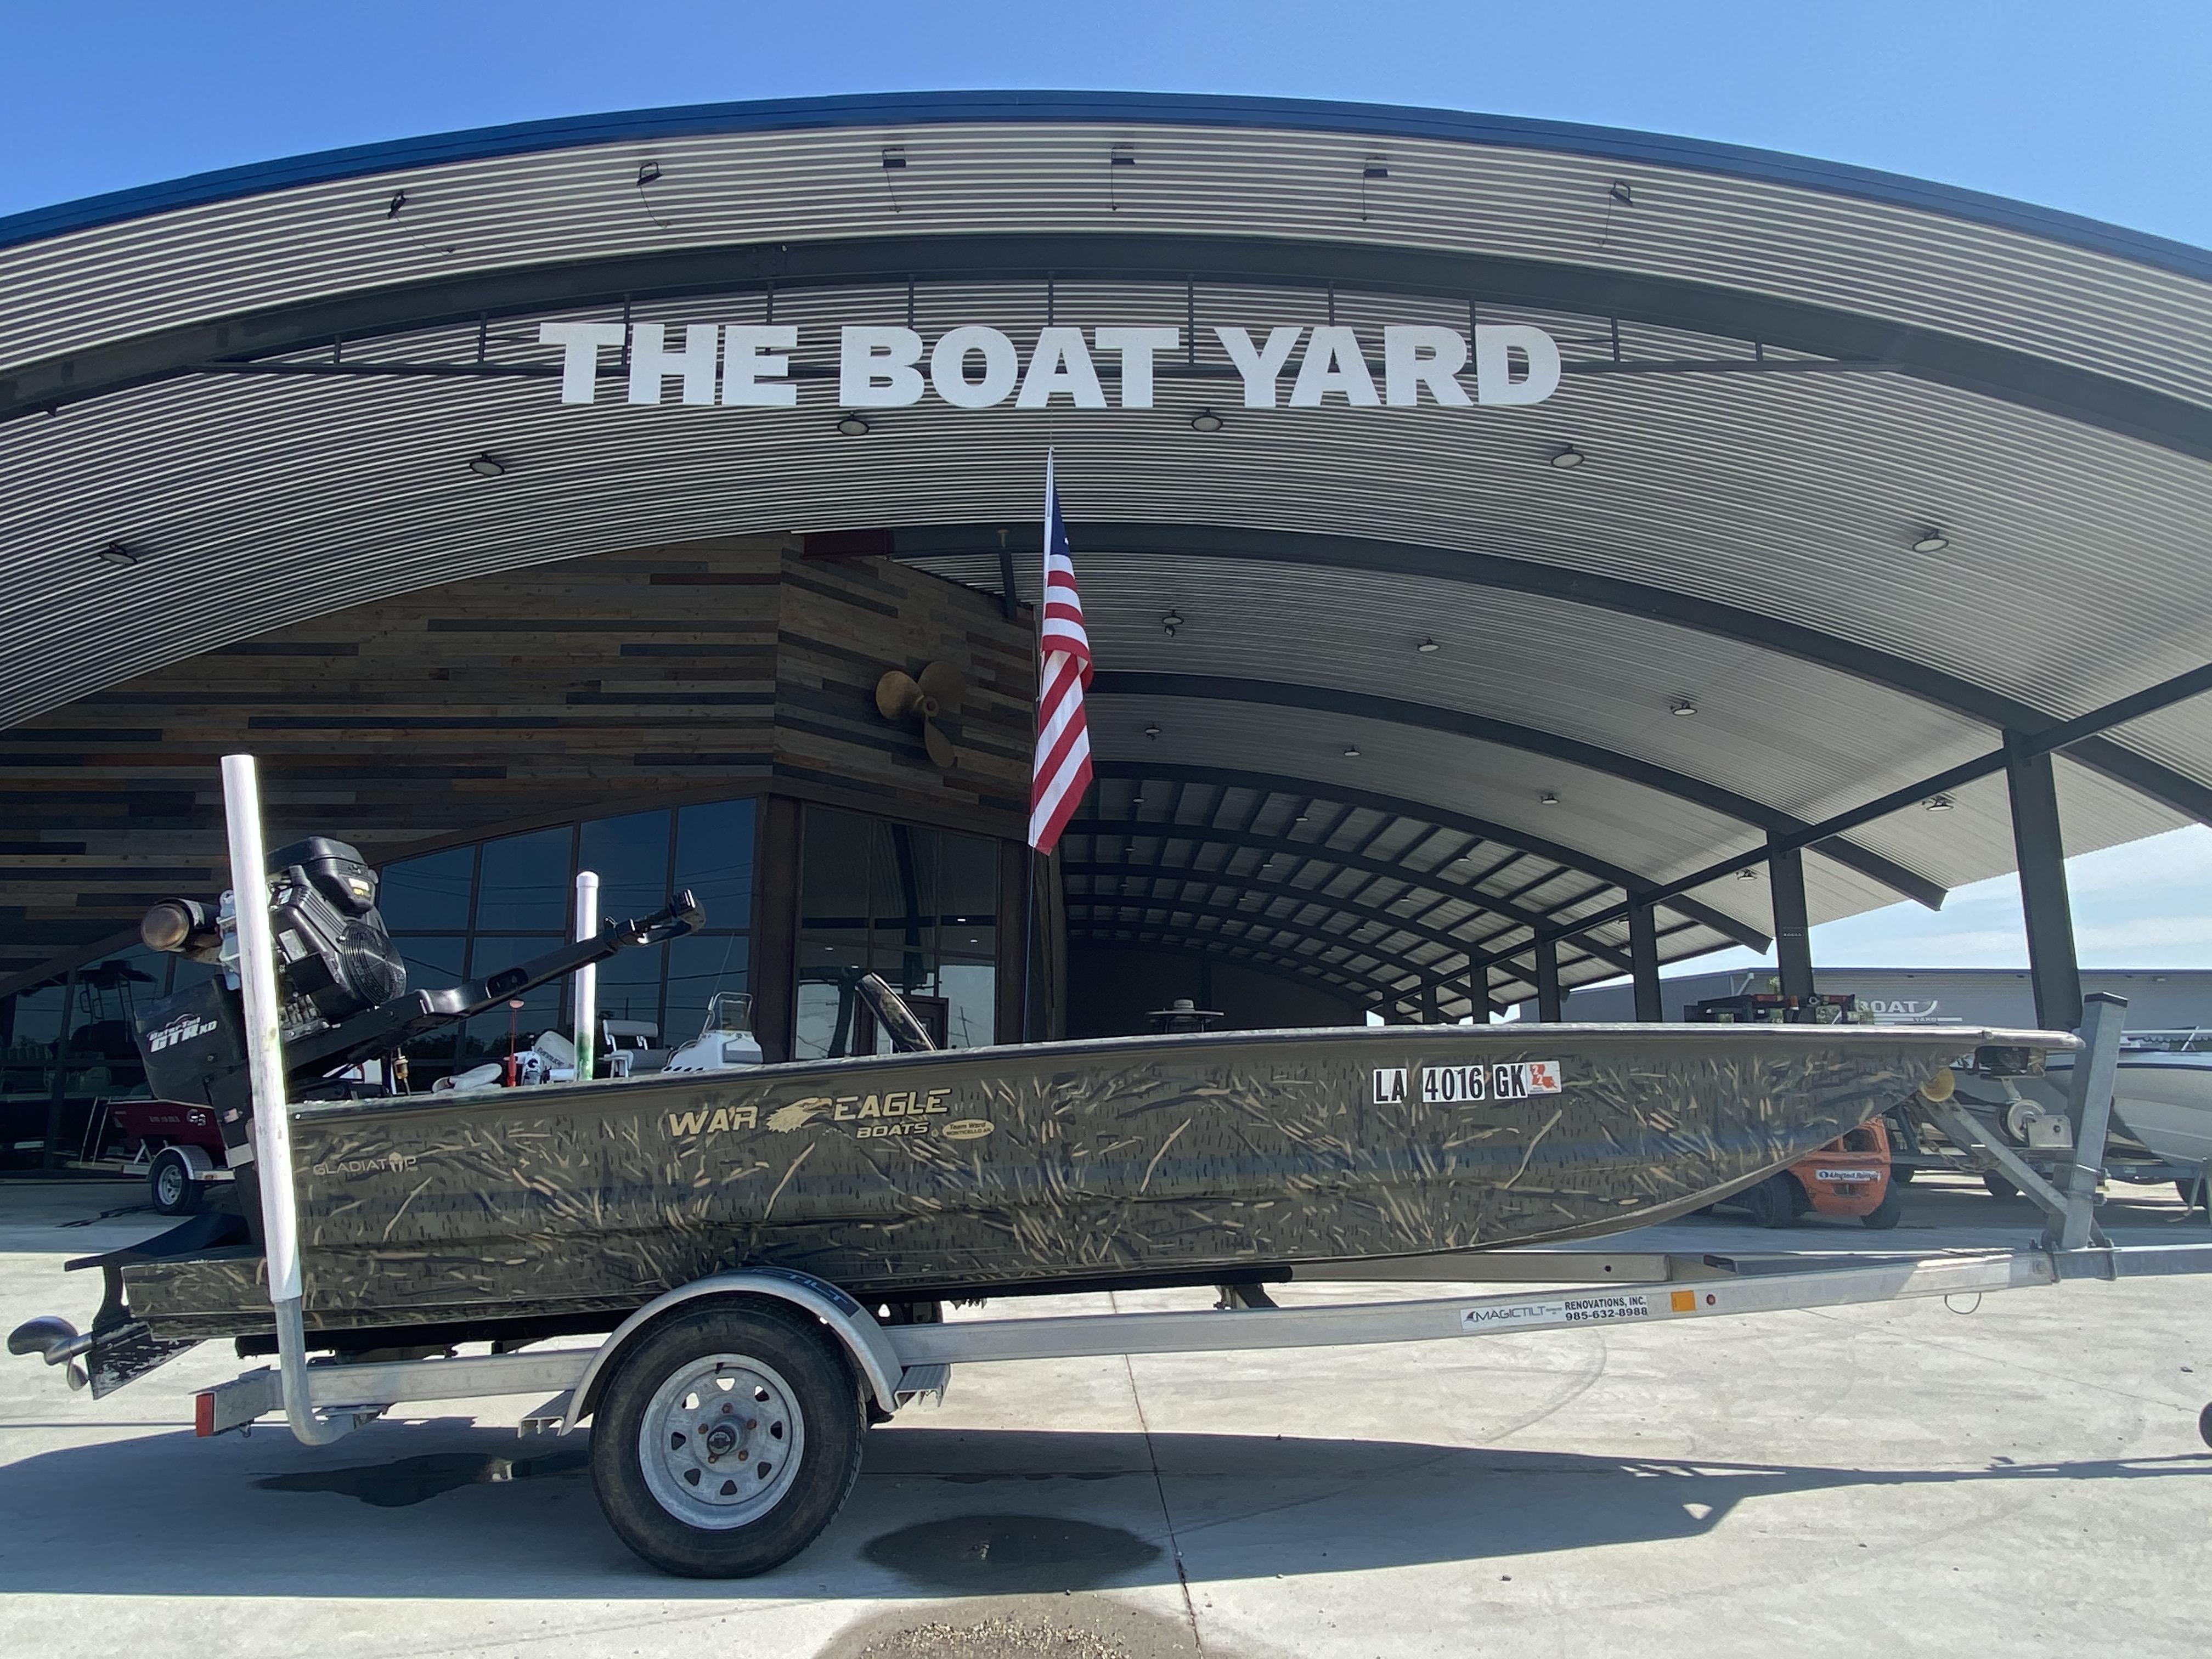 2020 War Eagle boat for sale, model of the boat is Gladiator 750 & Image # 1 of 11